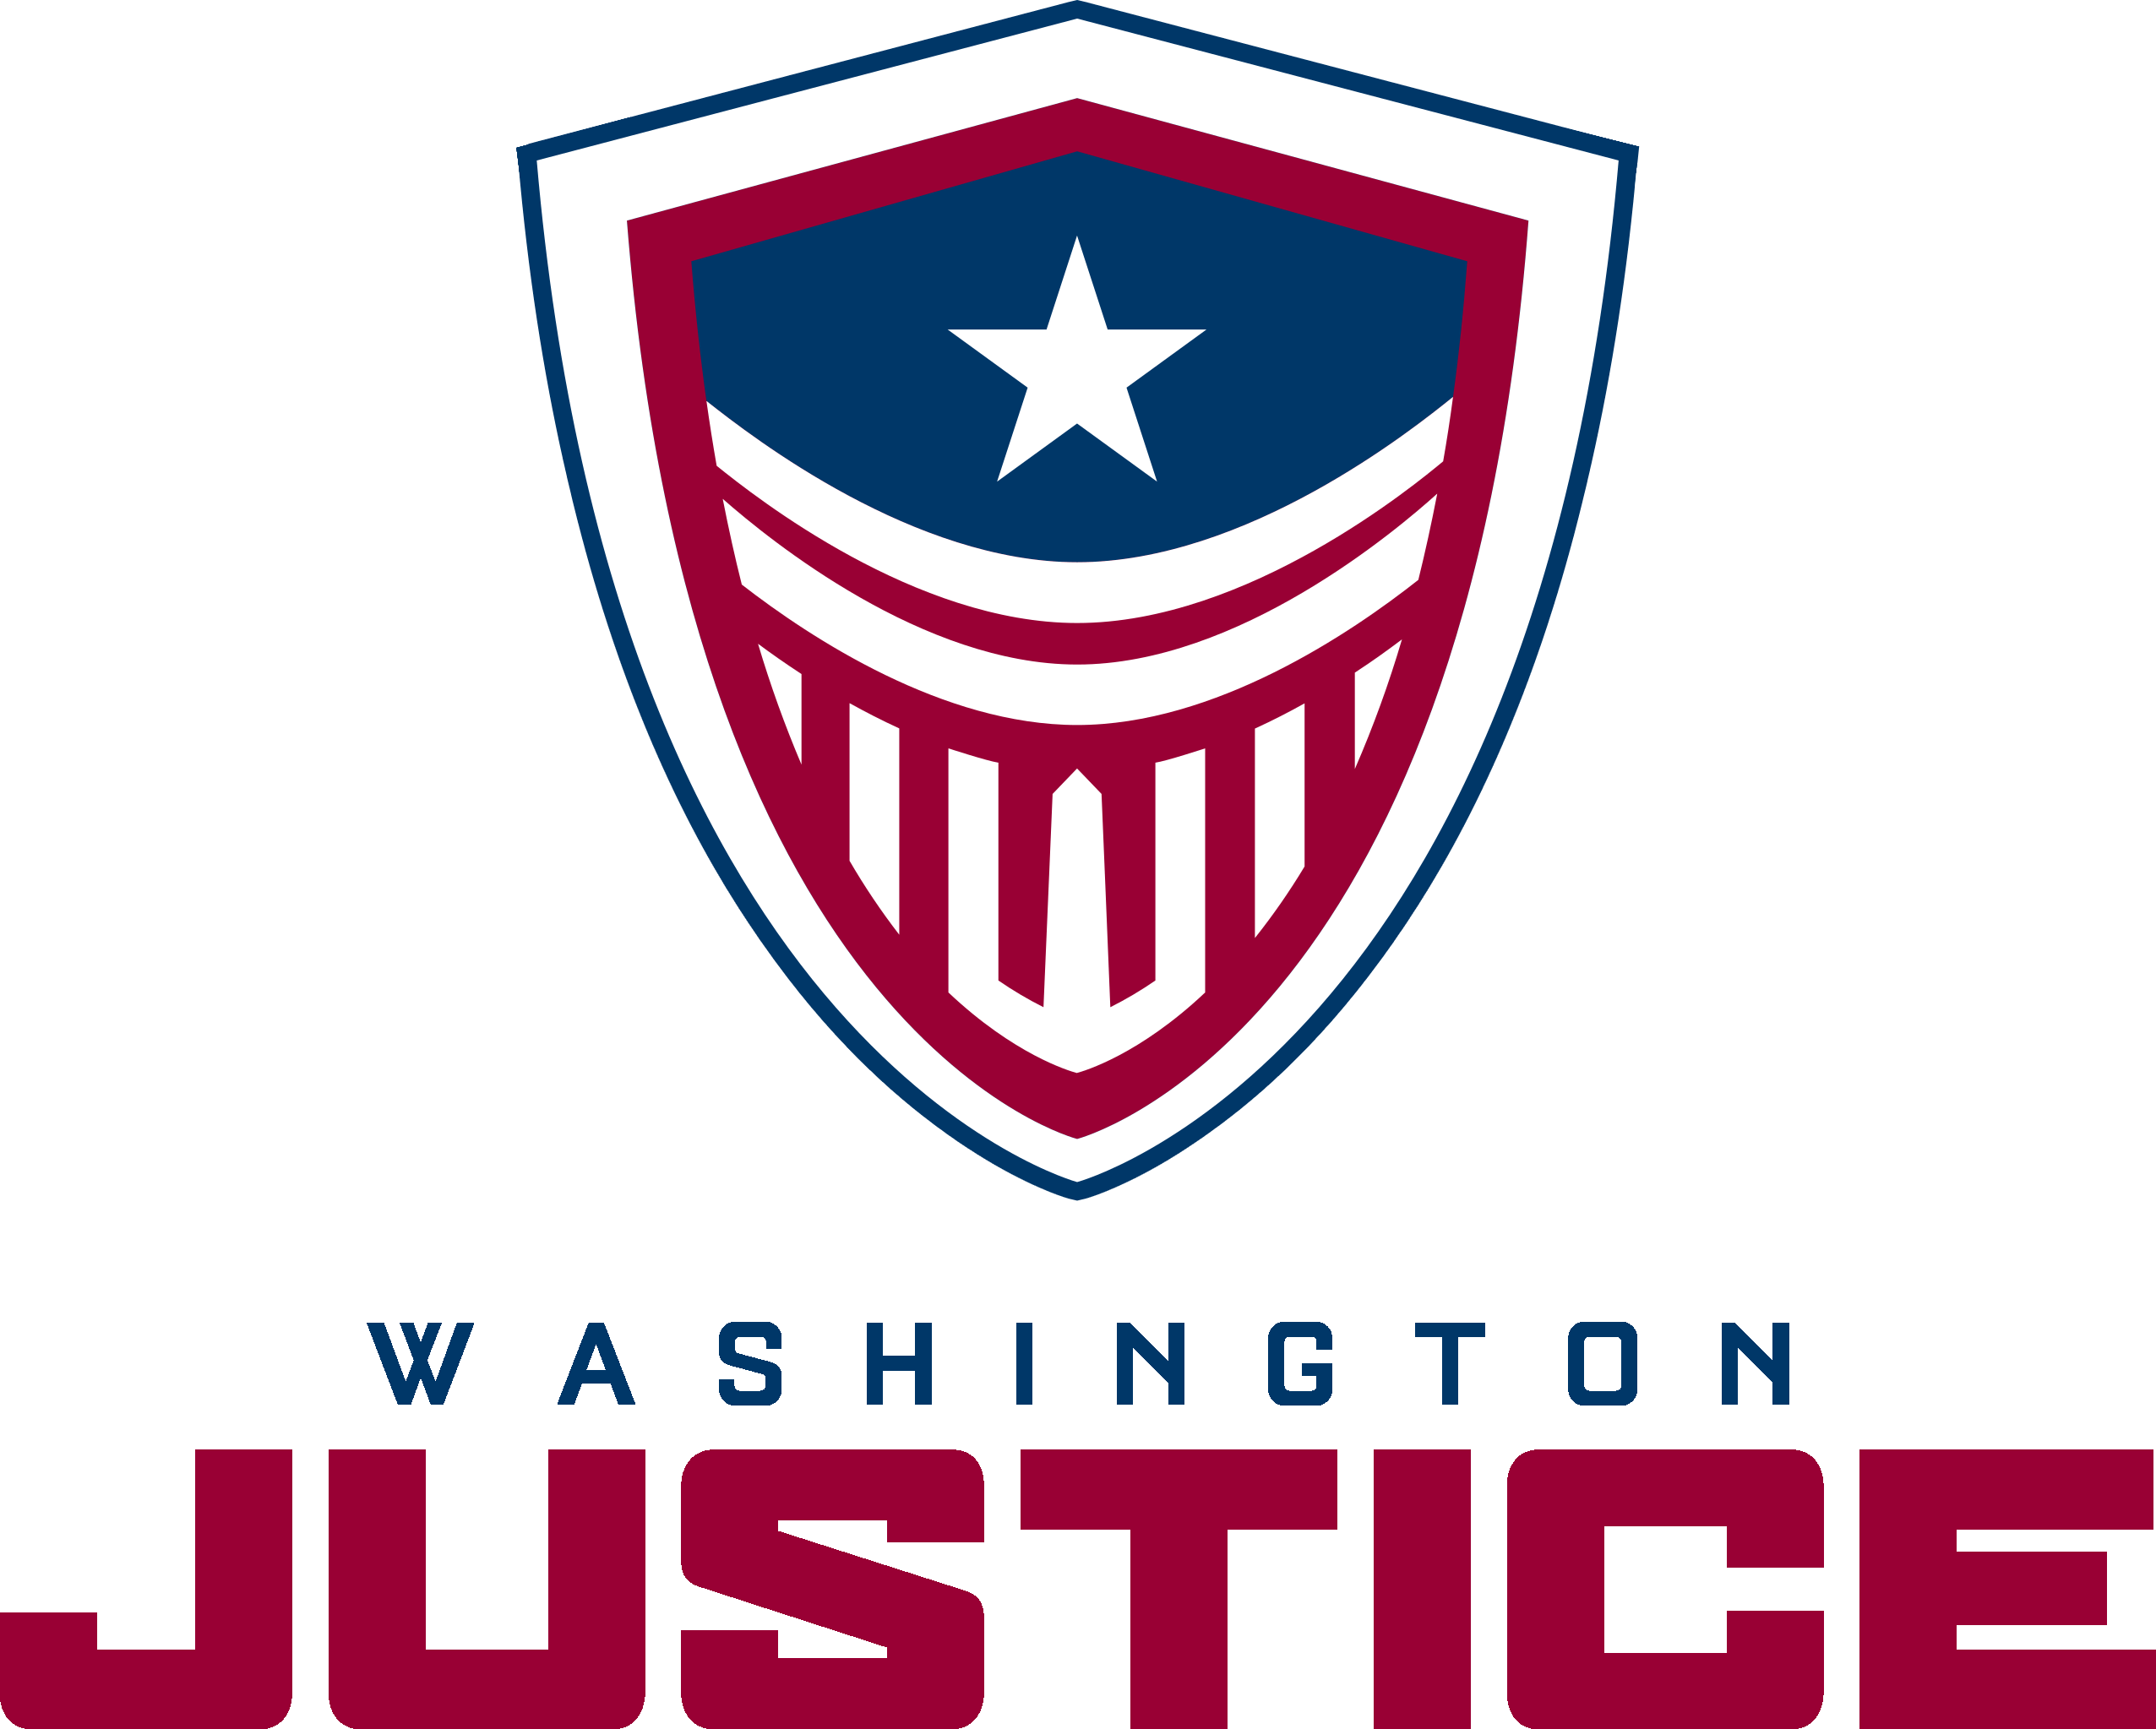 Washington Justice Overwatch Team Logo